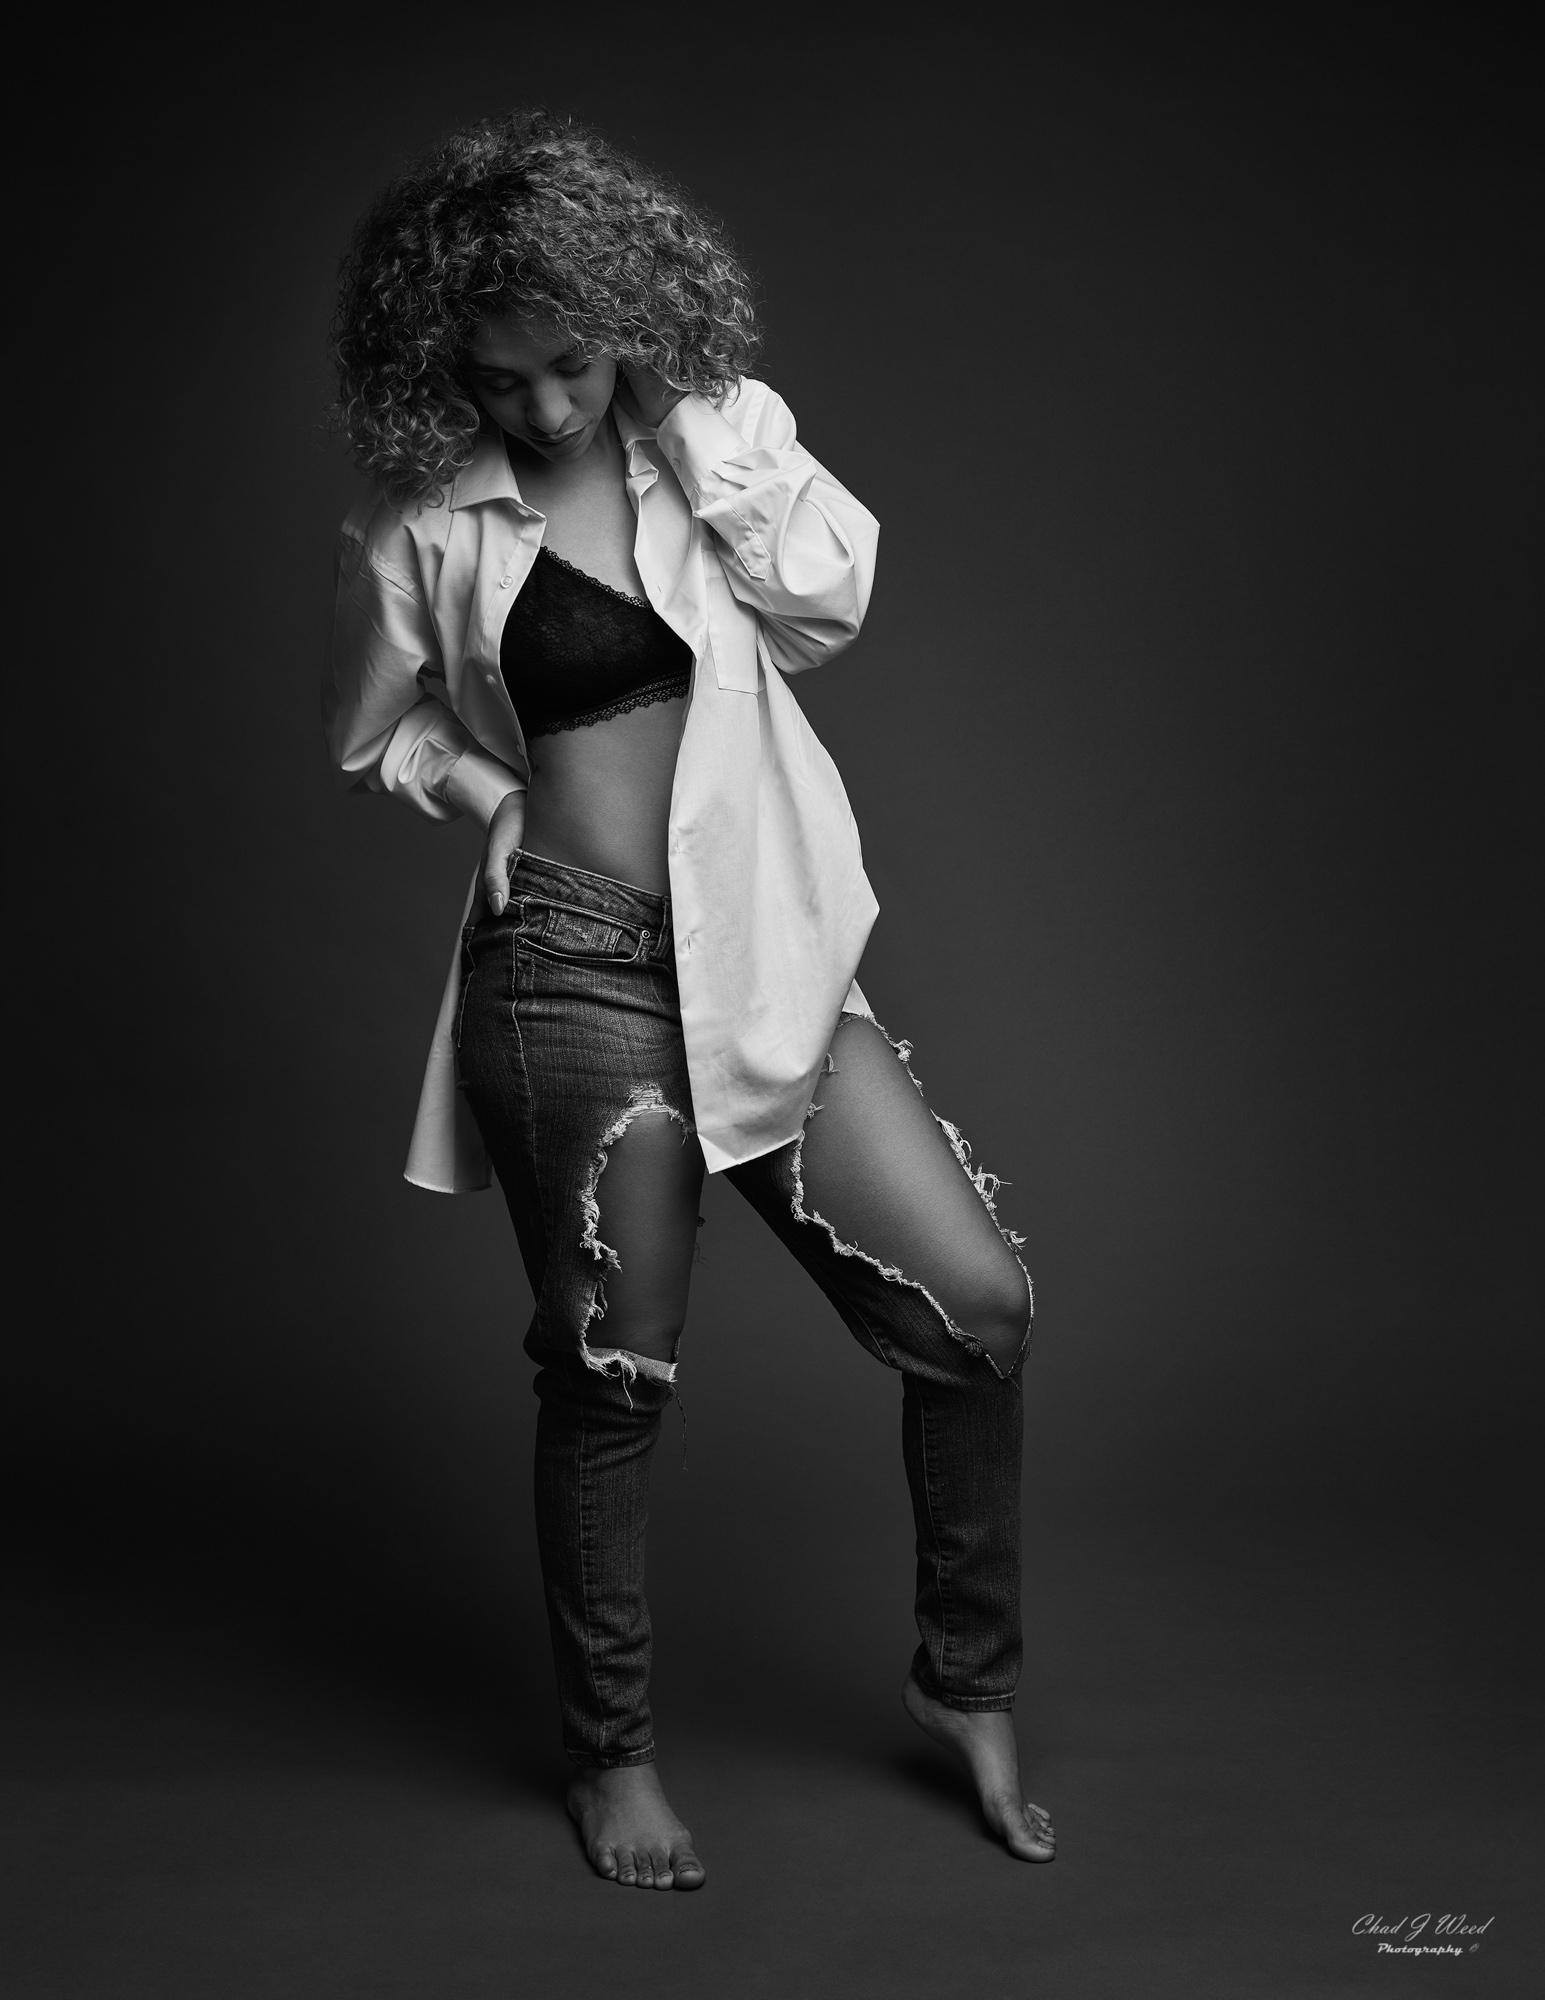 Victoria Fashion Model by Arizona Fashion Portrait Photographer Chad Weed